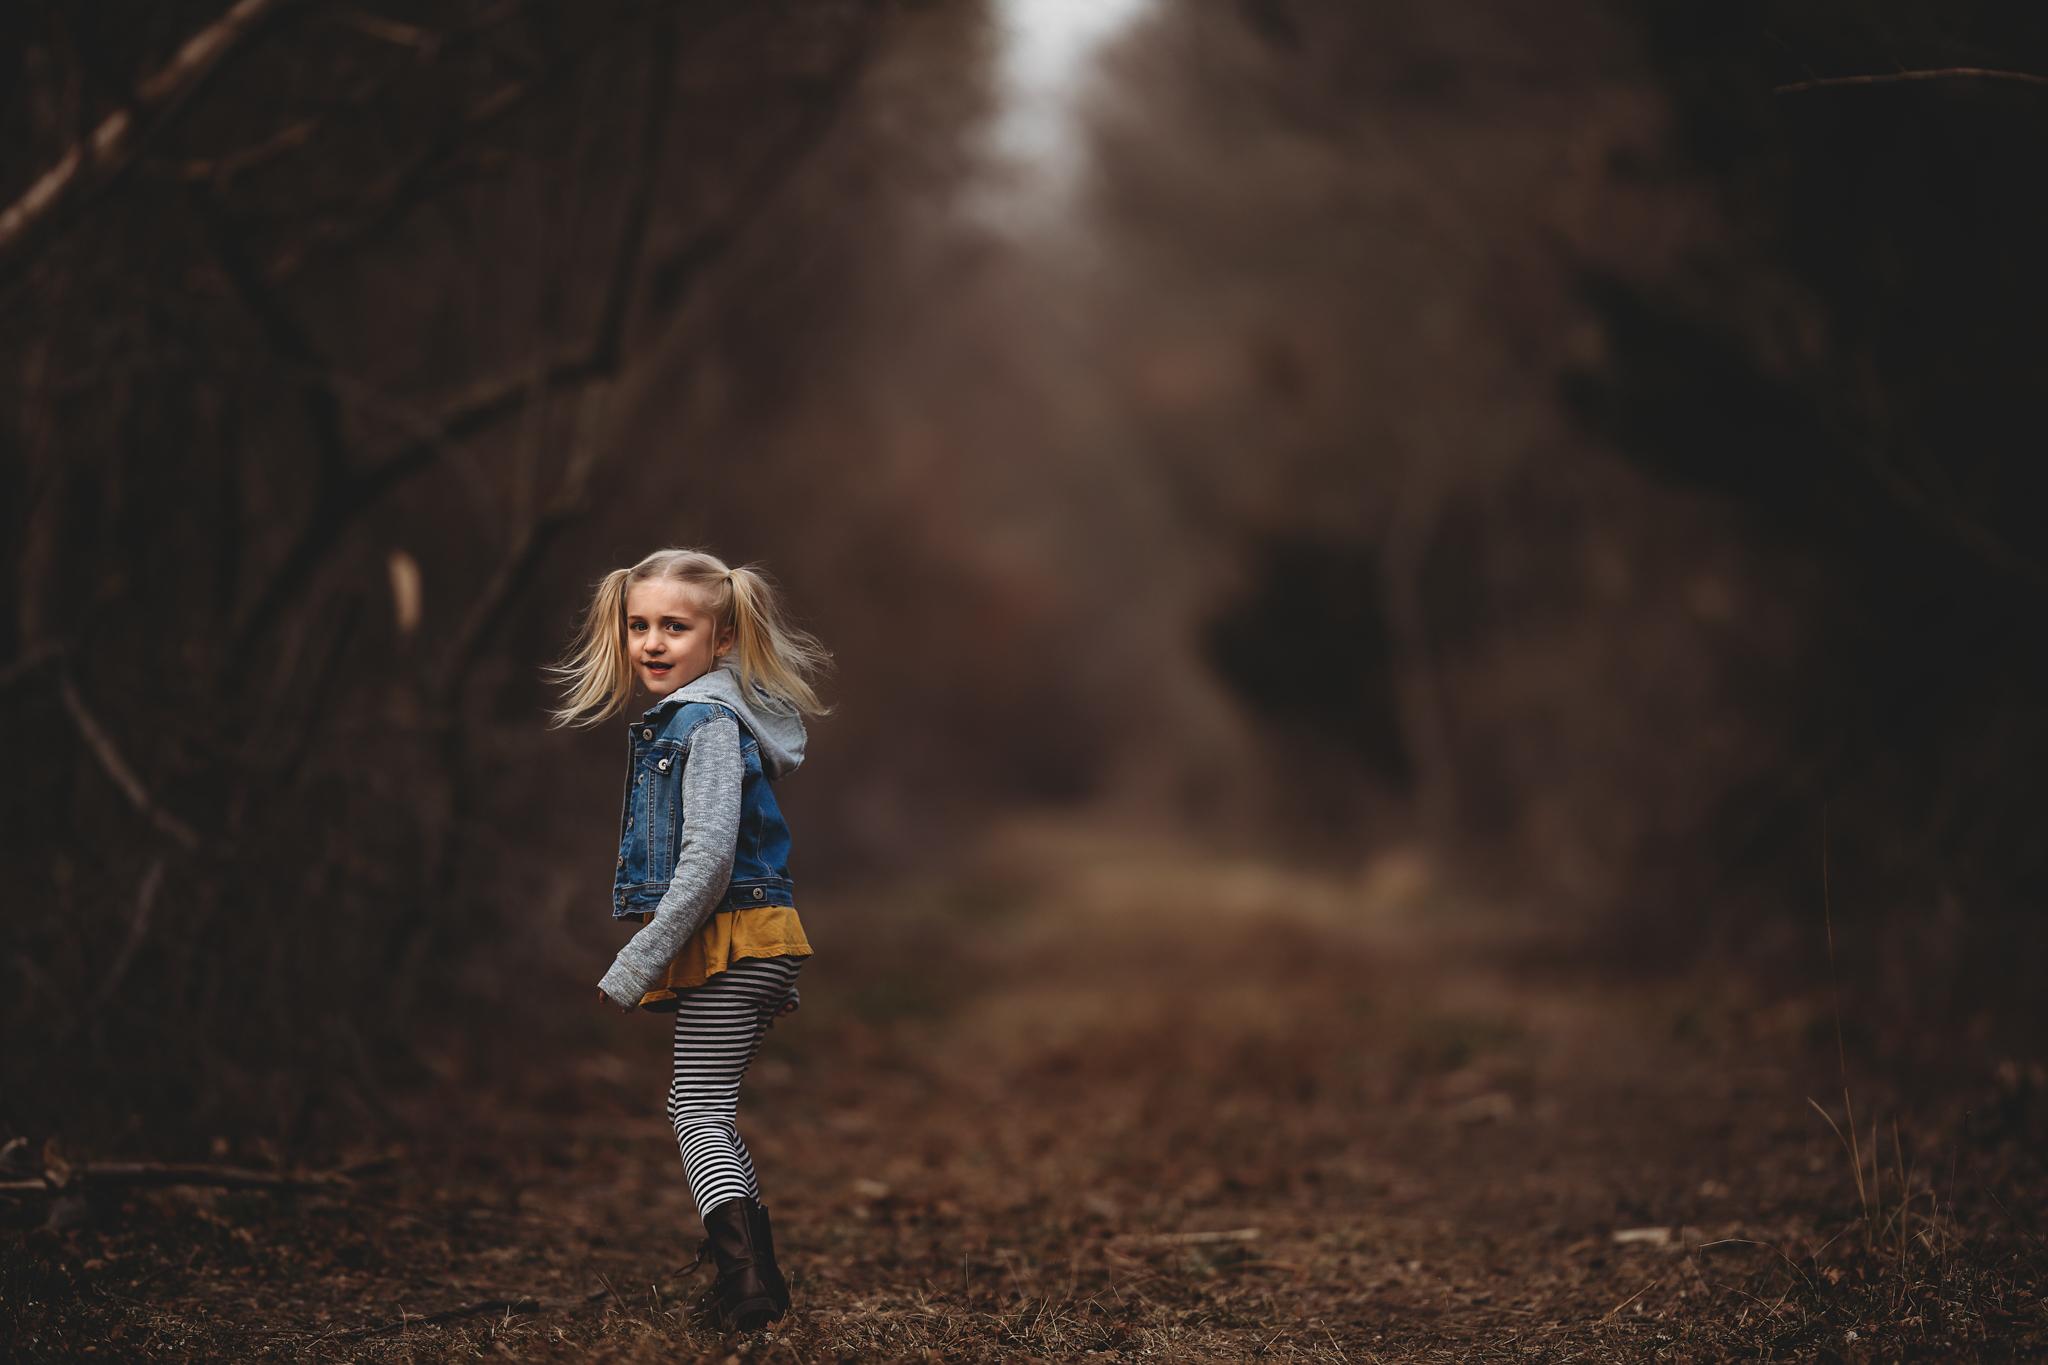 Long-island-photographer-hello-olivia-photography-children-kids-photos-new-york-lifestyle-portraits-suffolk-County-LI-49.jpg